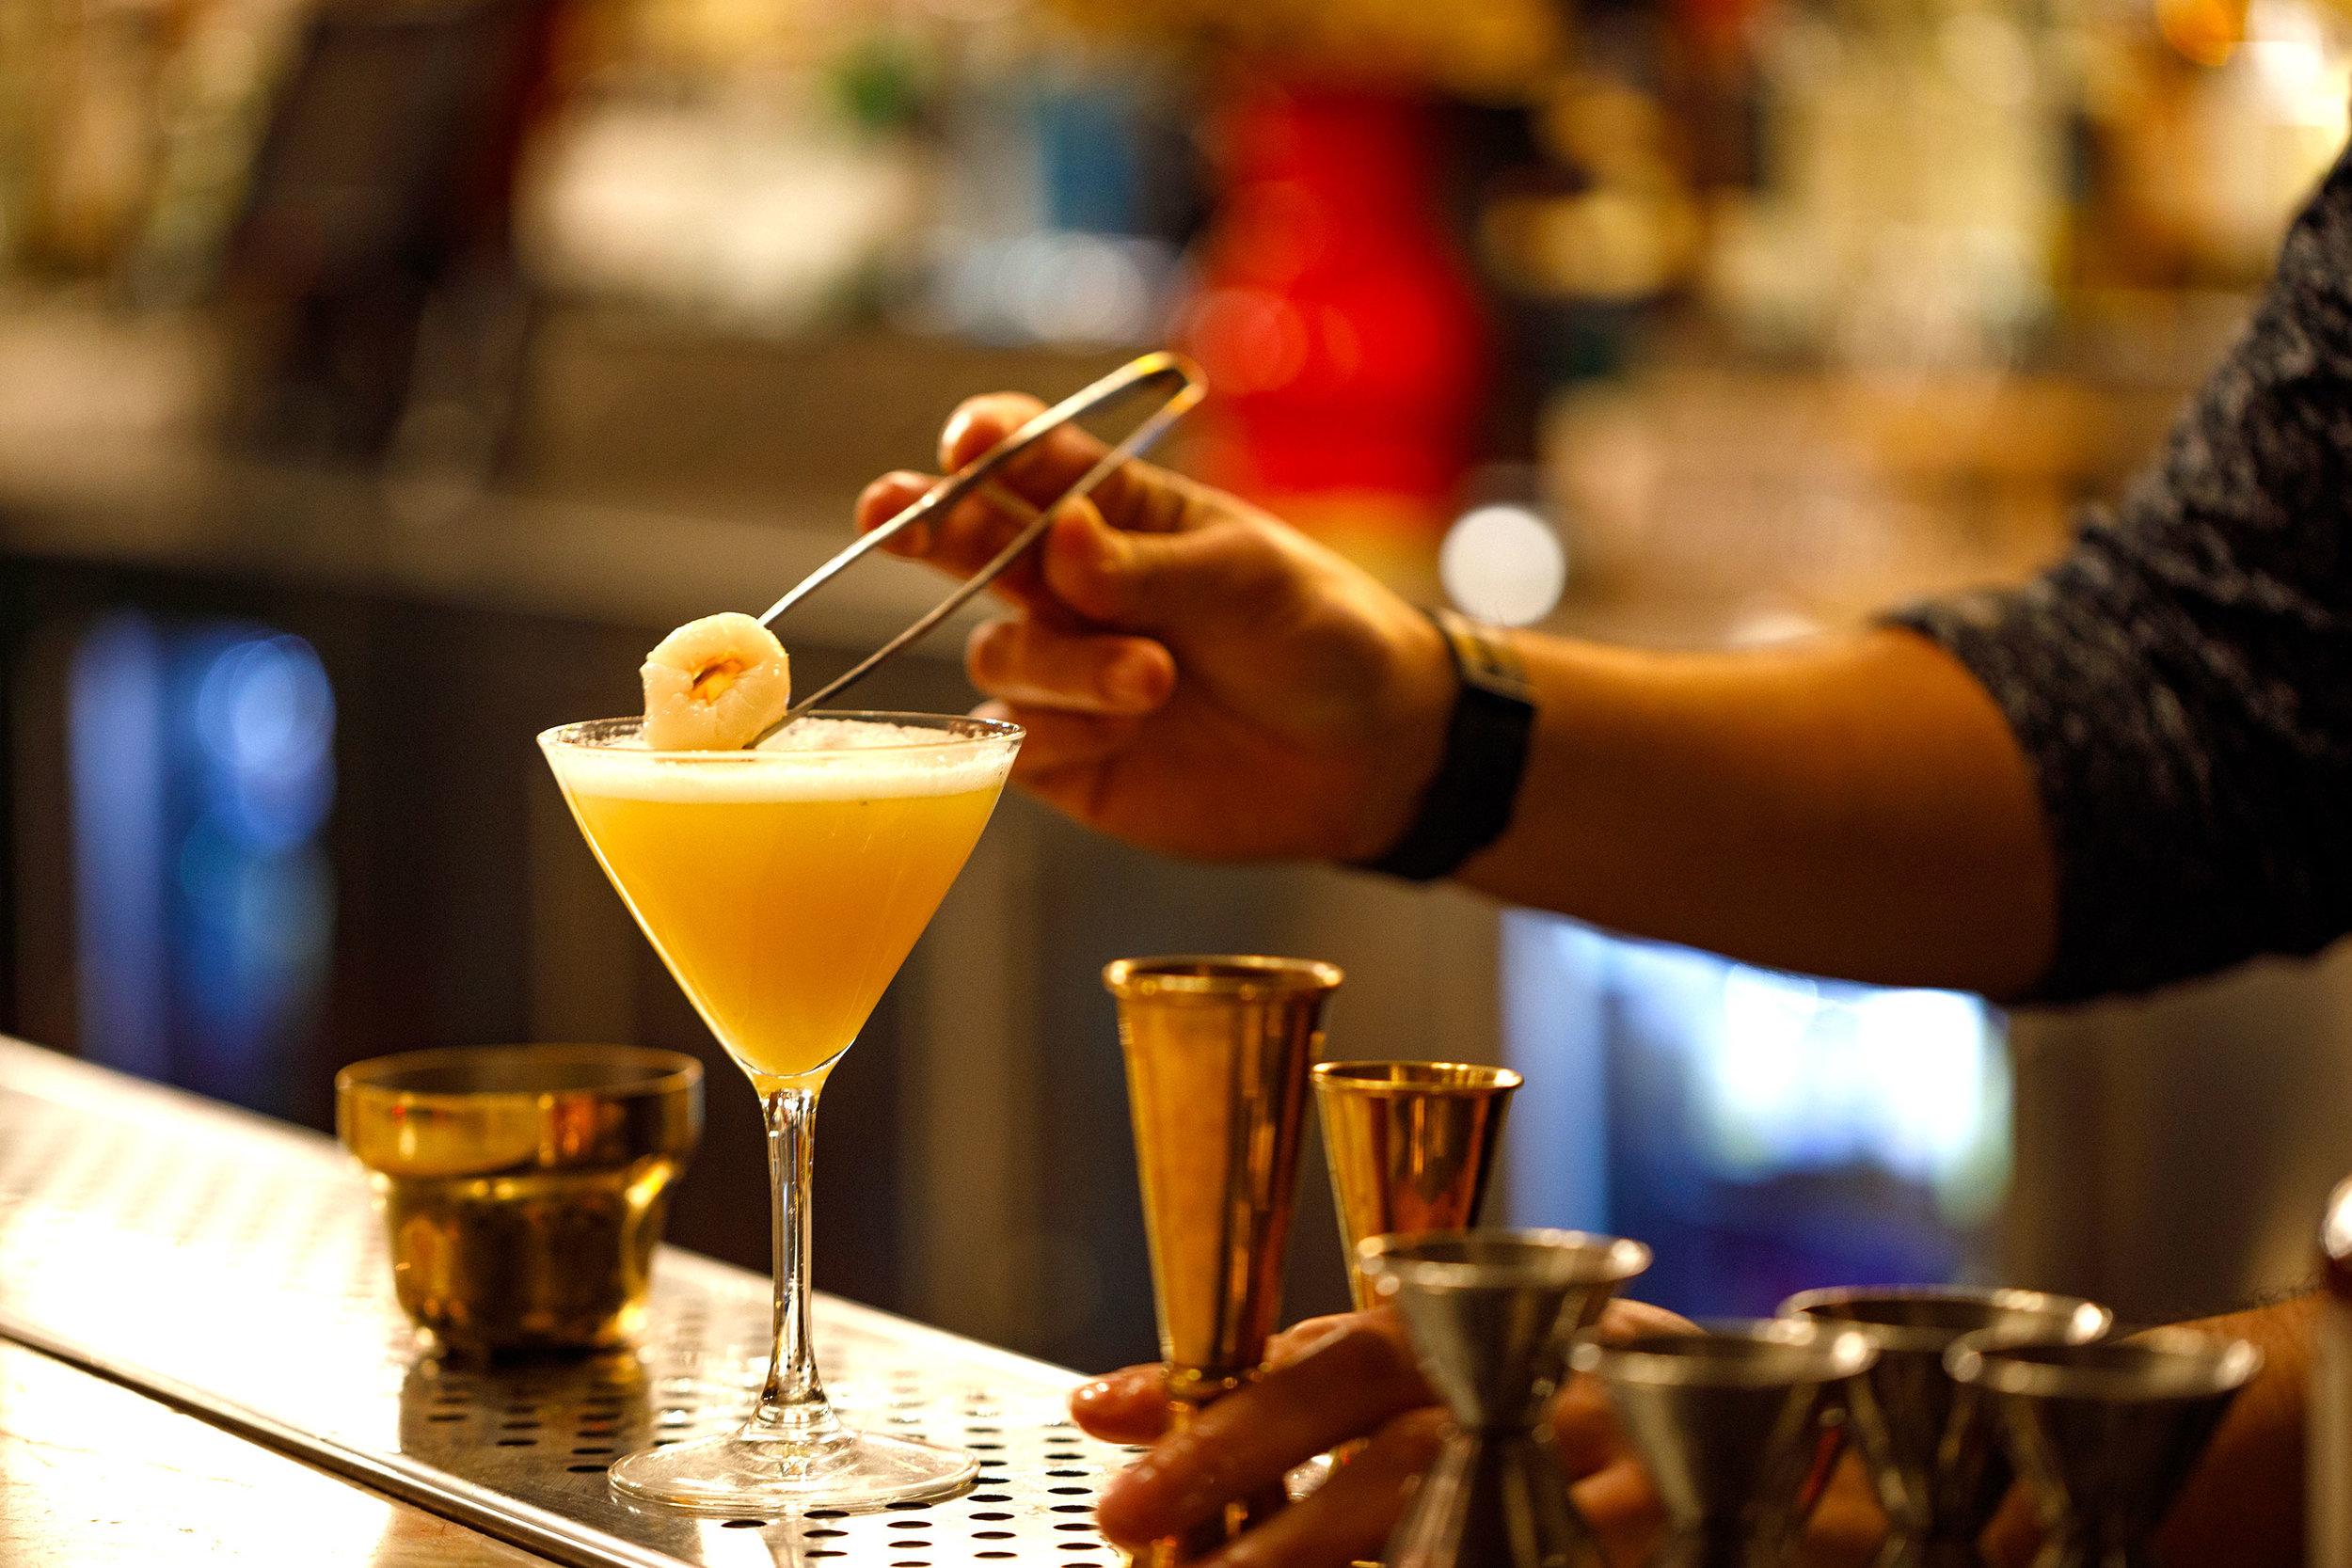 Making 'Lychee Martini'